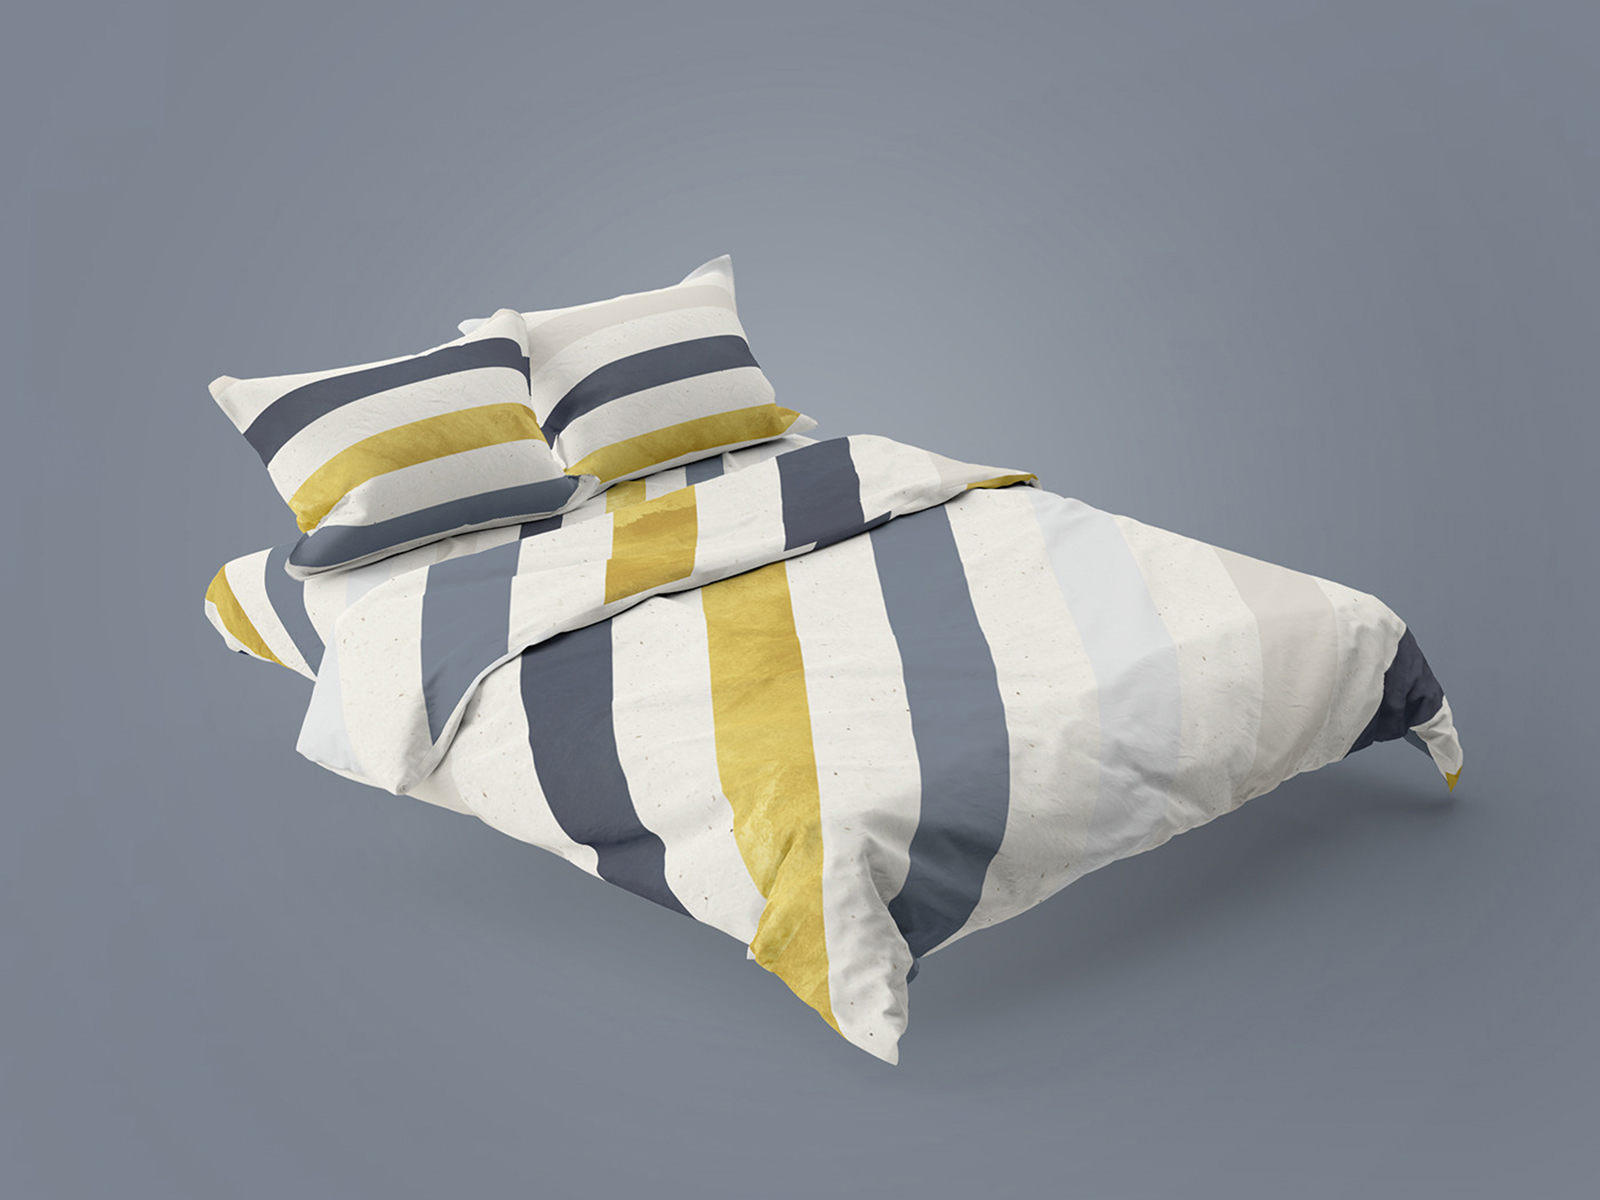 Free Bedding Home Textile Design Mockup